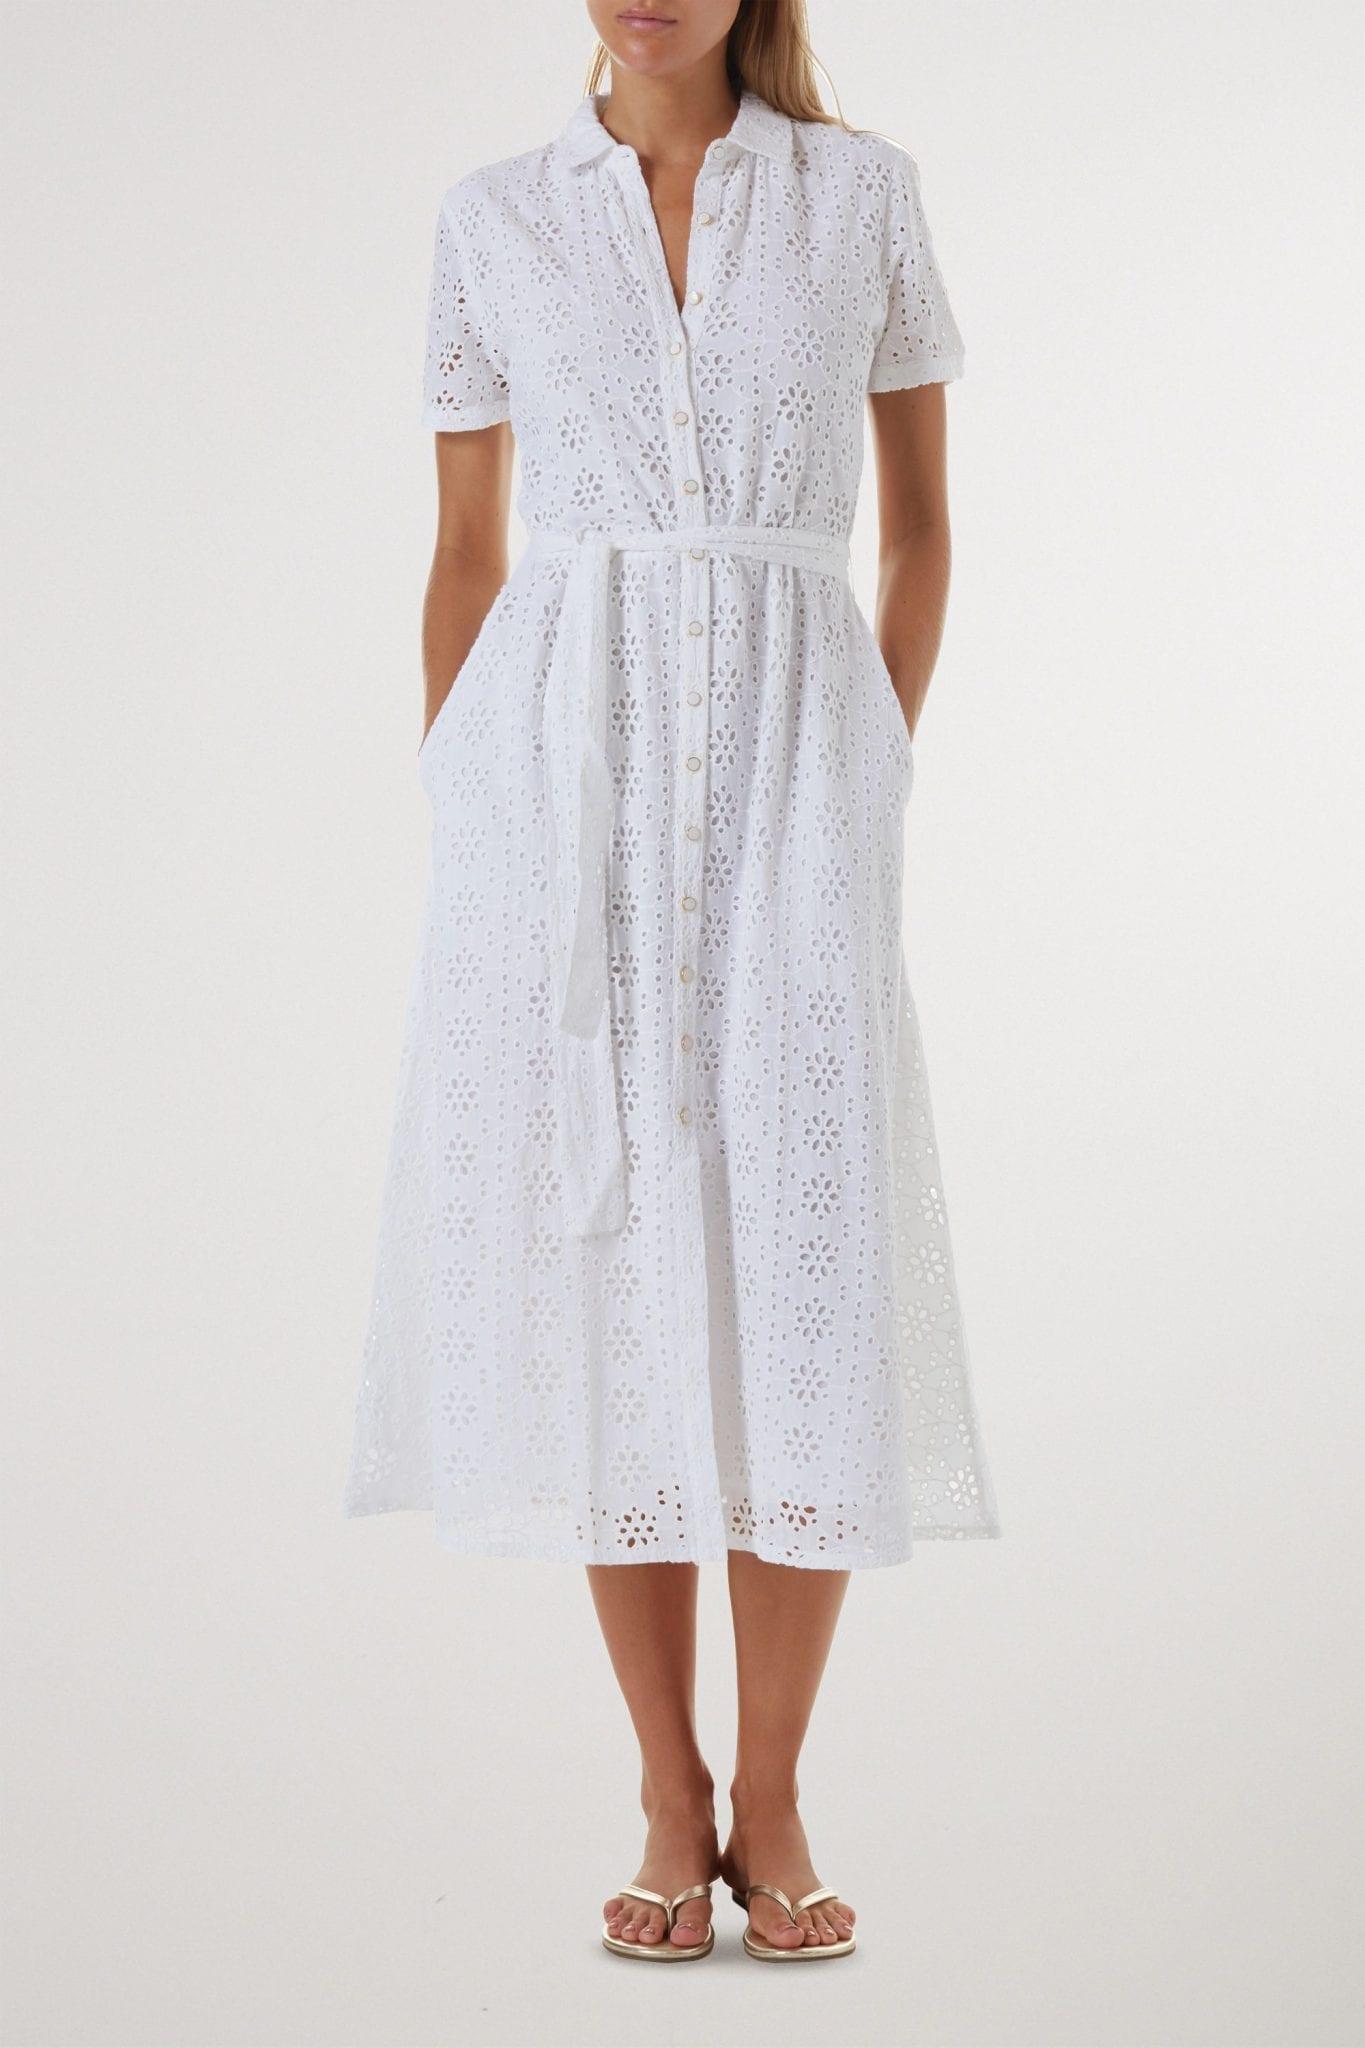 MELISSA ODABASH Vanessa Belted Broderie Anglaise Cotton Midi Shirt Dress